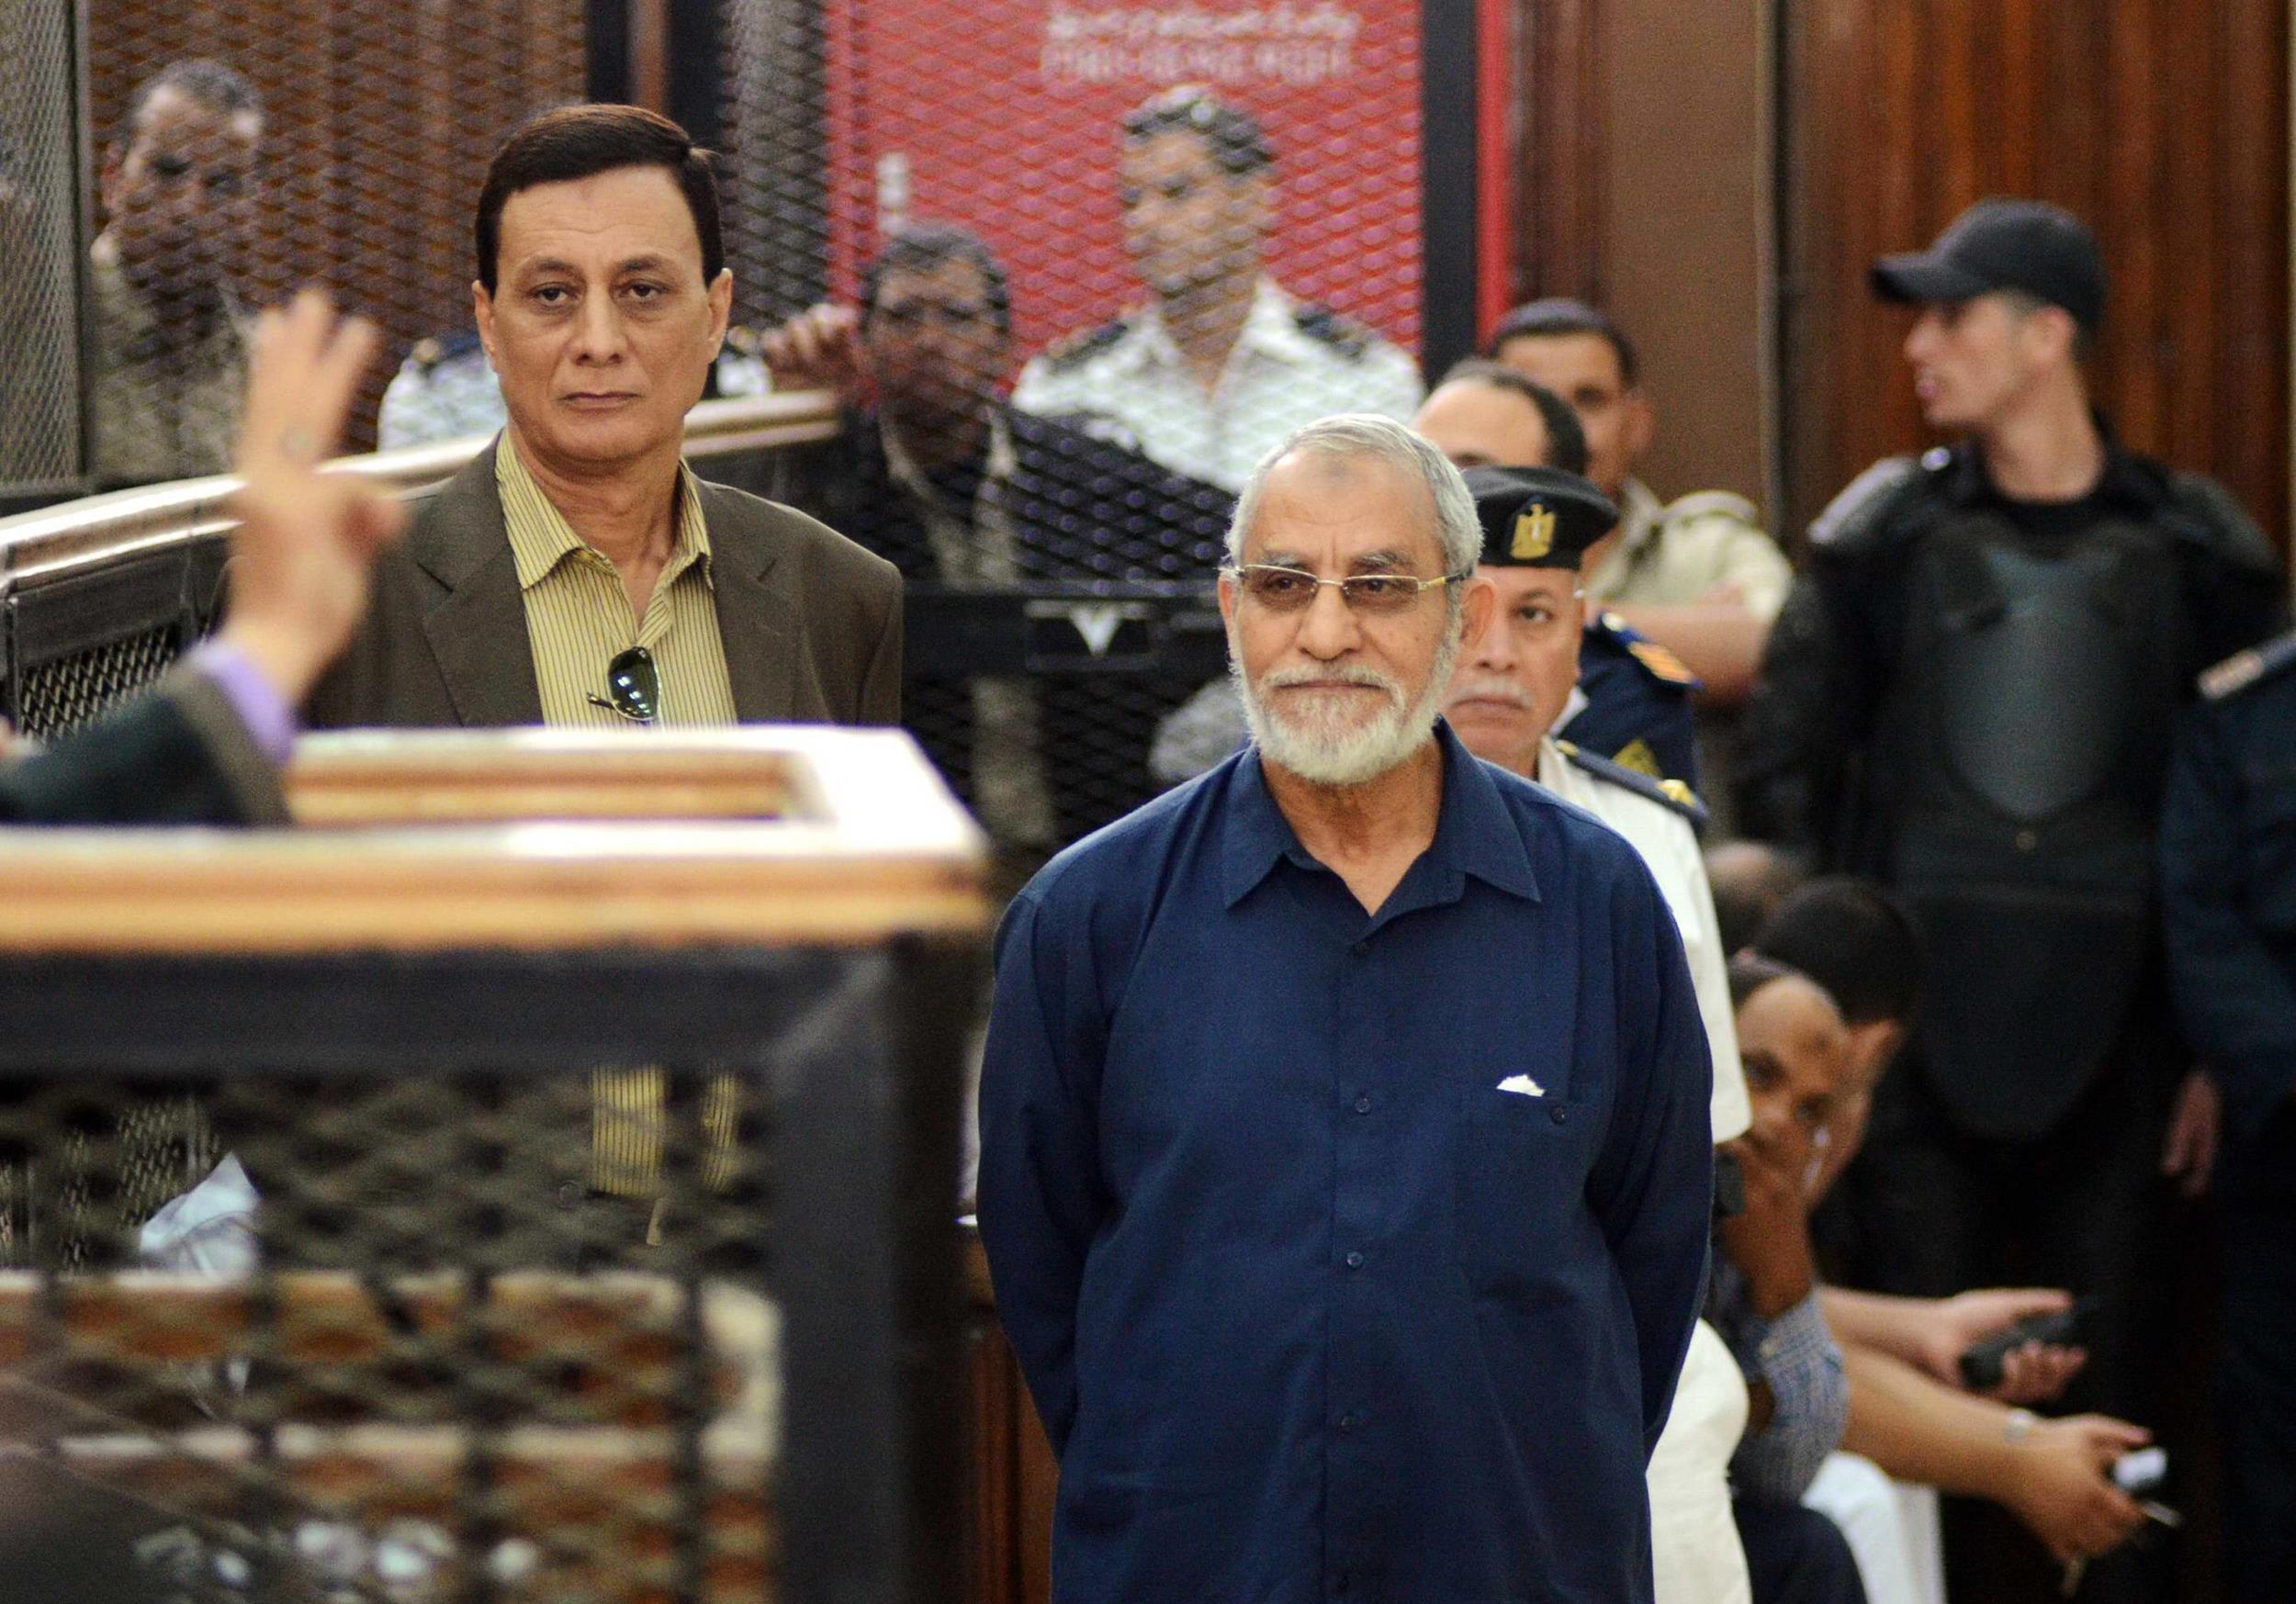 Image: Egyptian Brotherhood's supreme guide Mohamed Badie